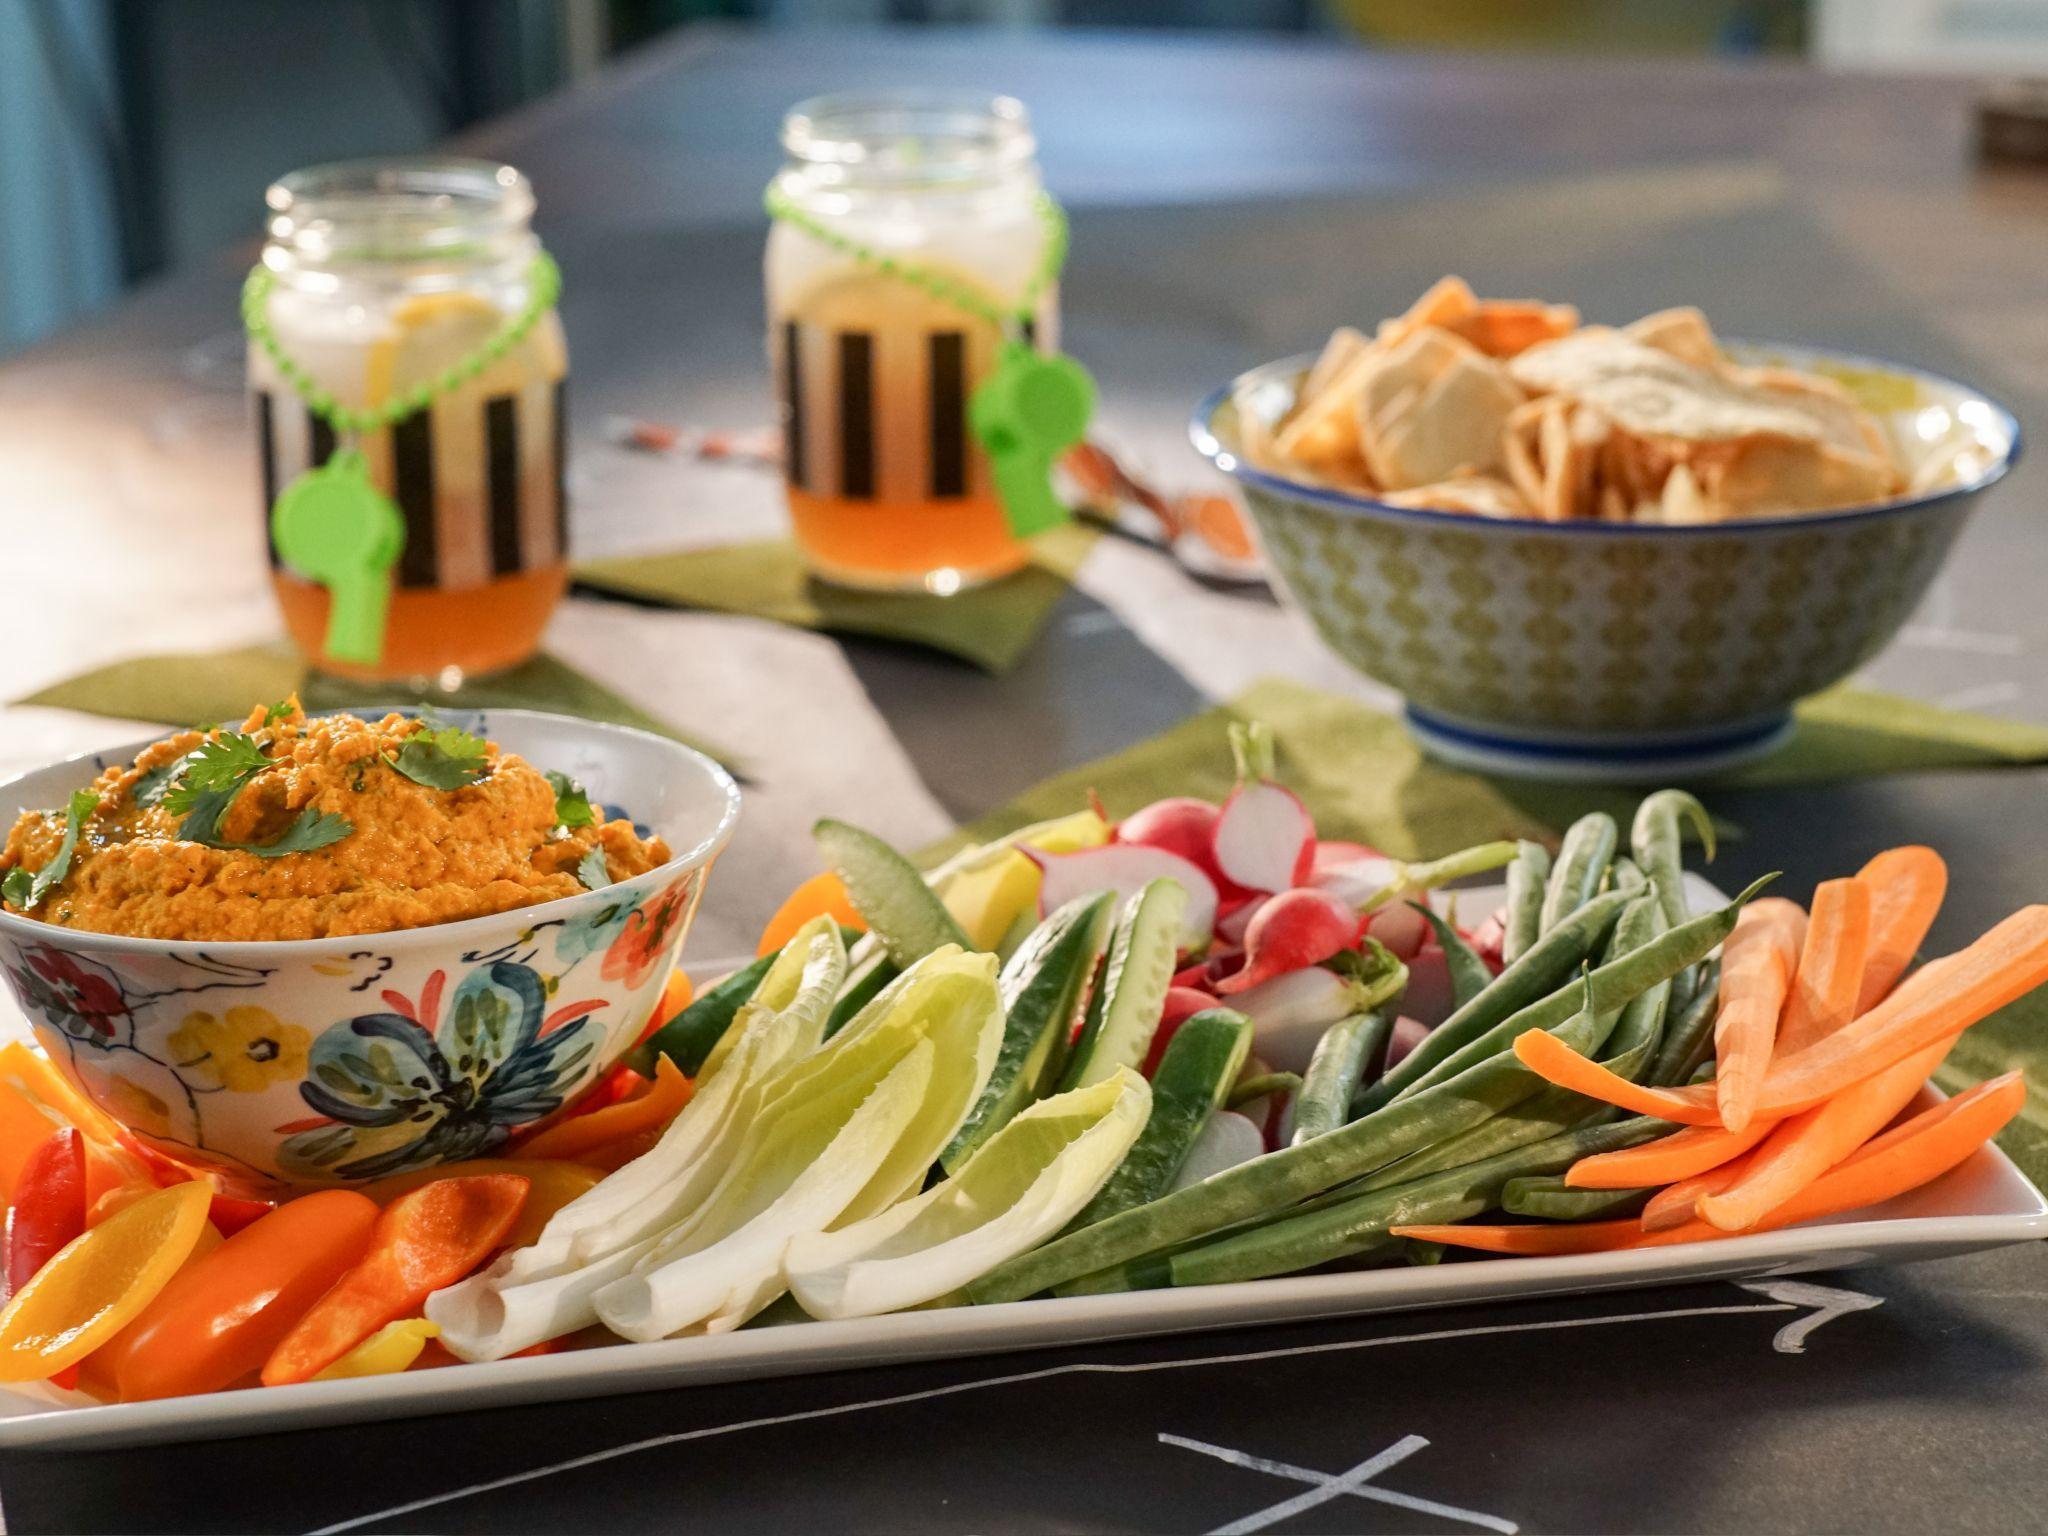 home food network recipes - HD2048×1536